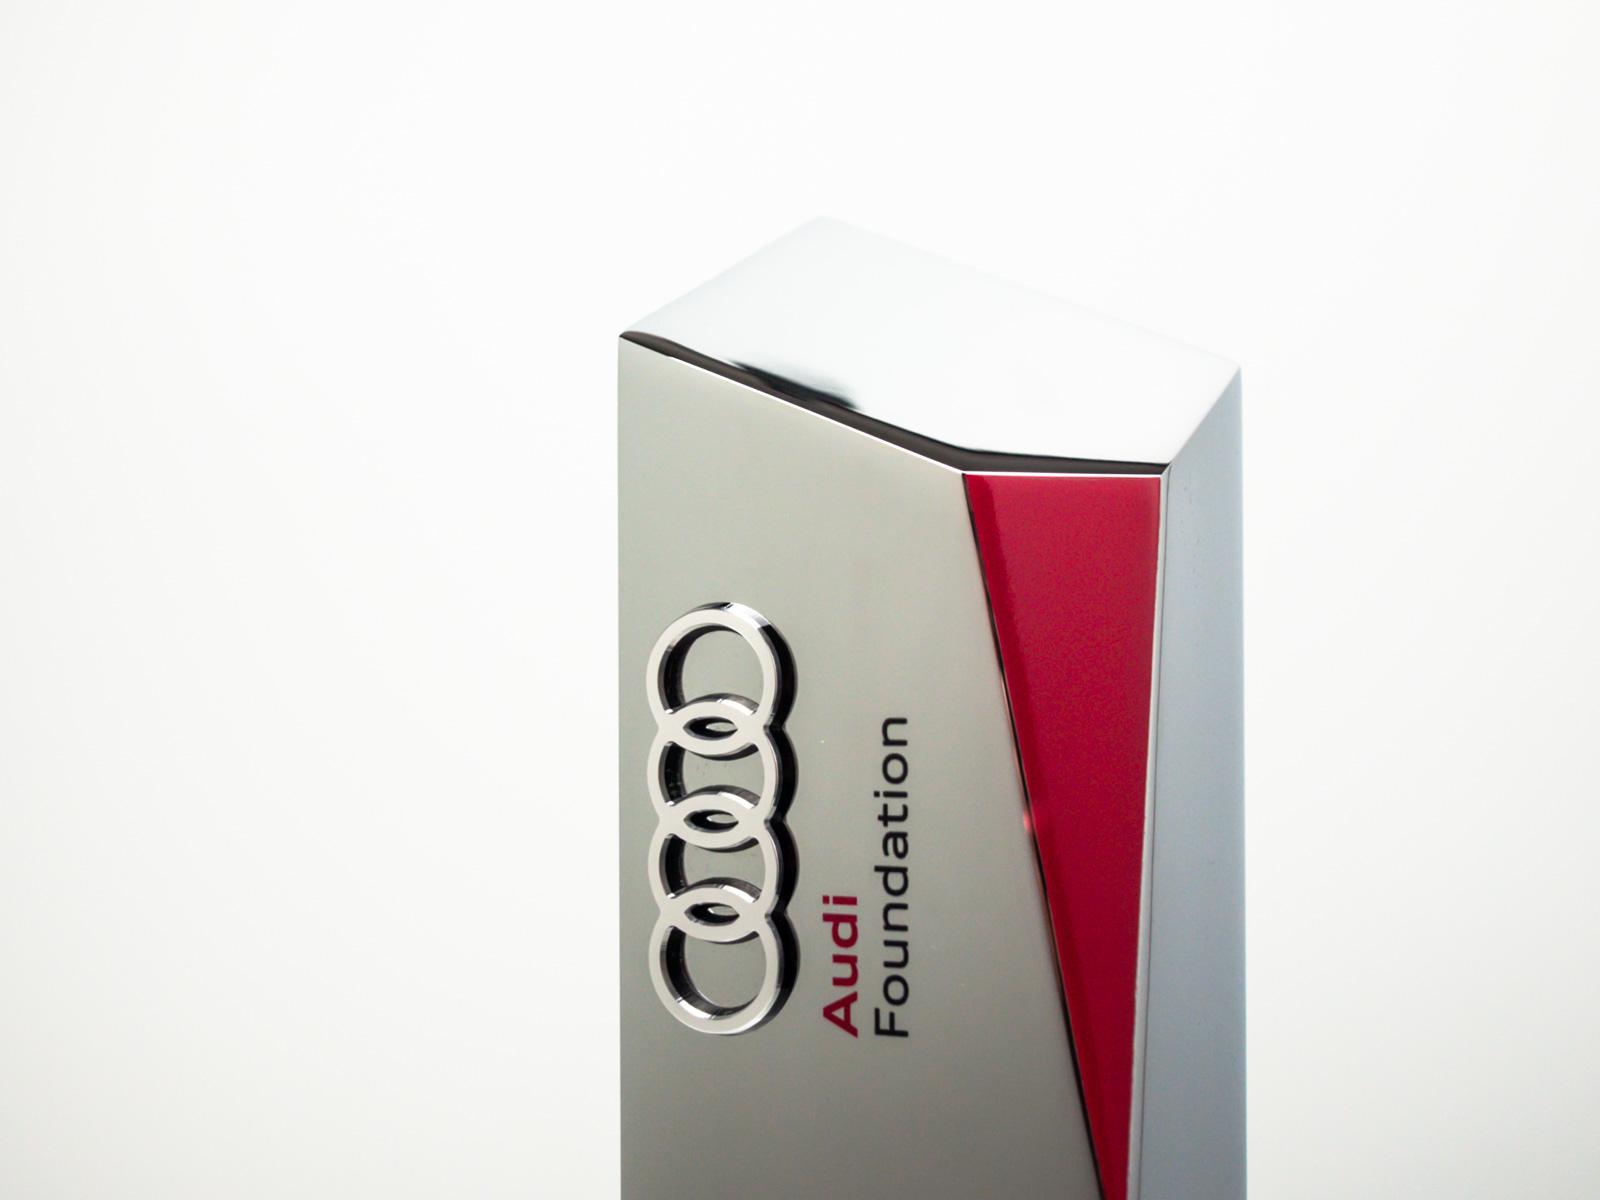 Audi Dealer of the Year Bespoke Awards Detail